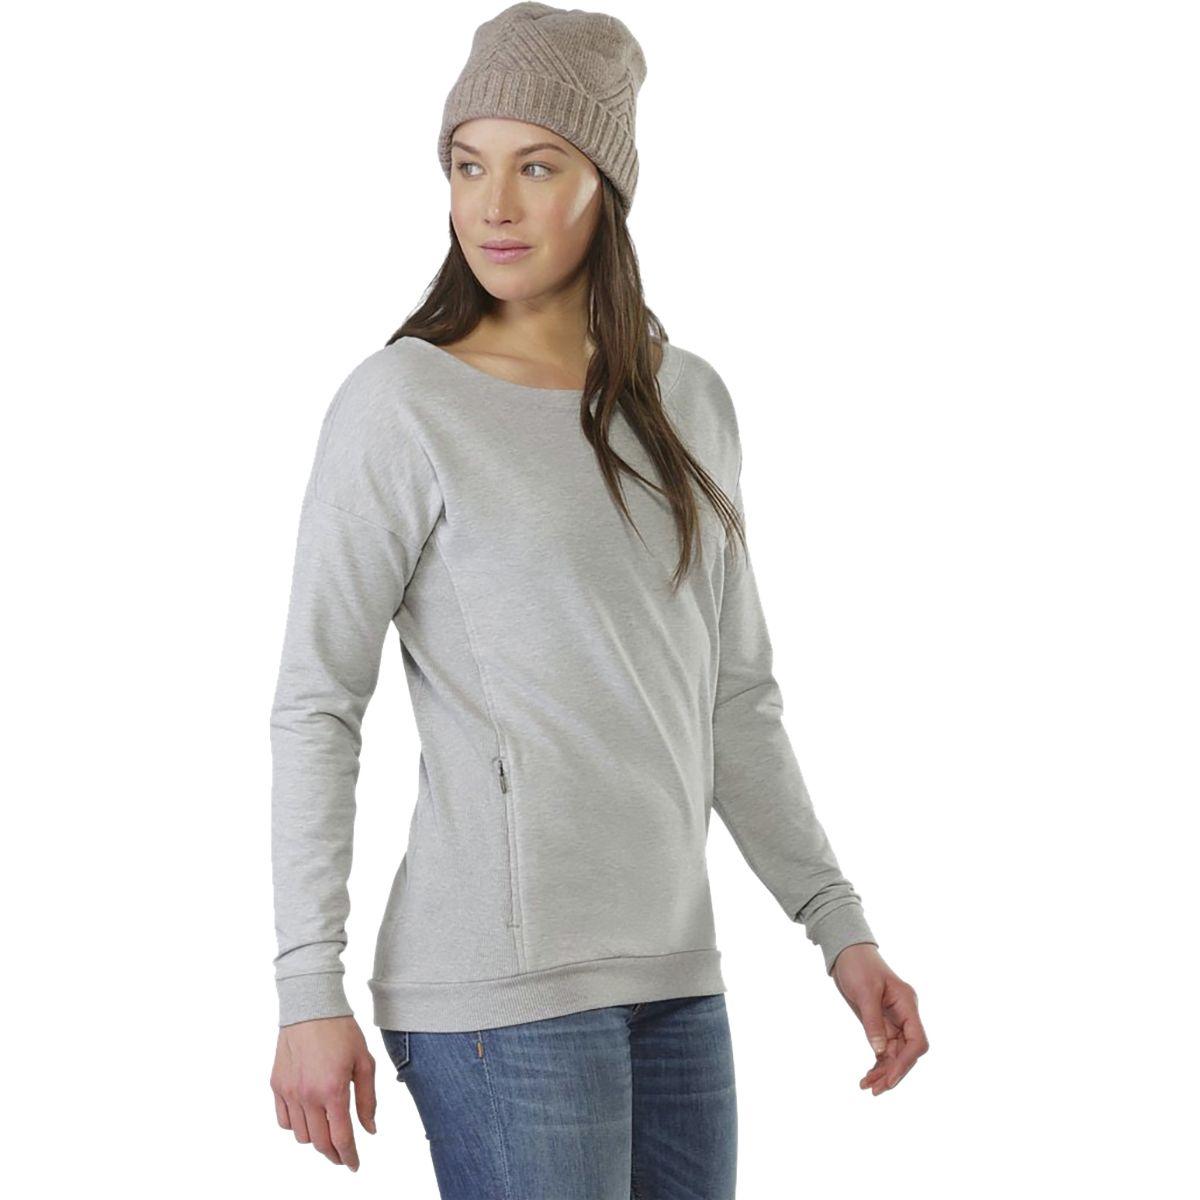 Arc'teryx Mini-Bird Sweatshirt